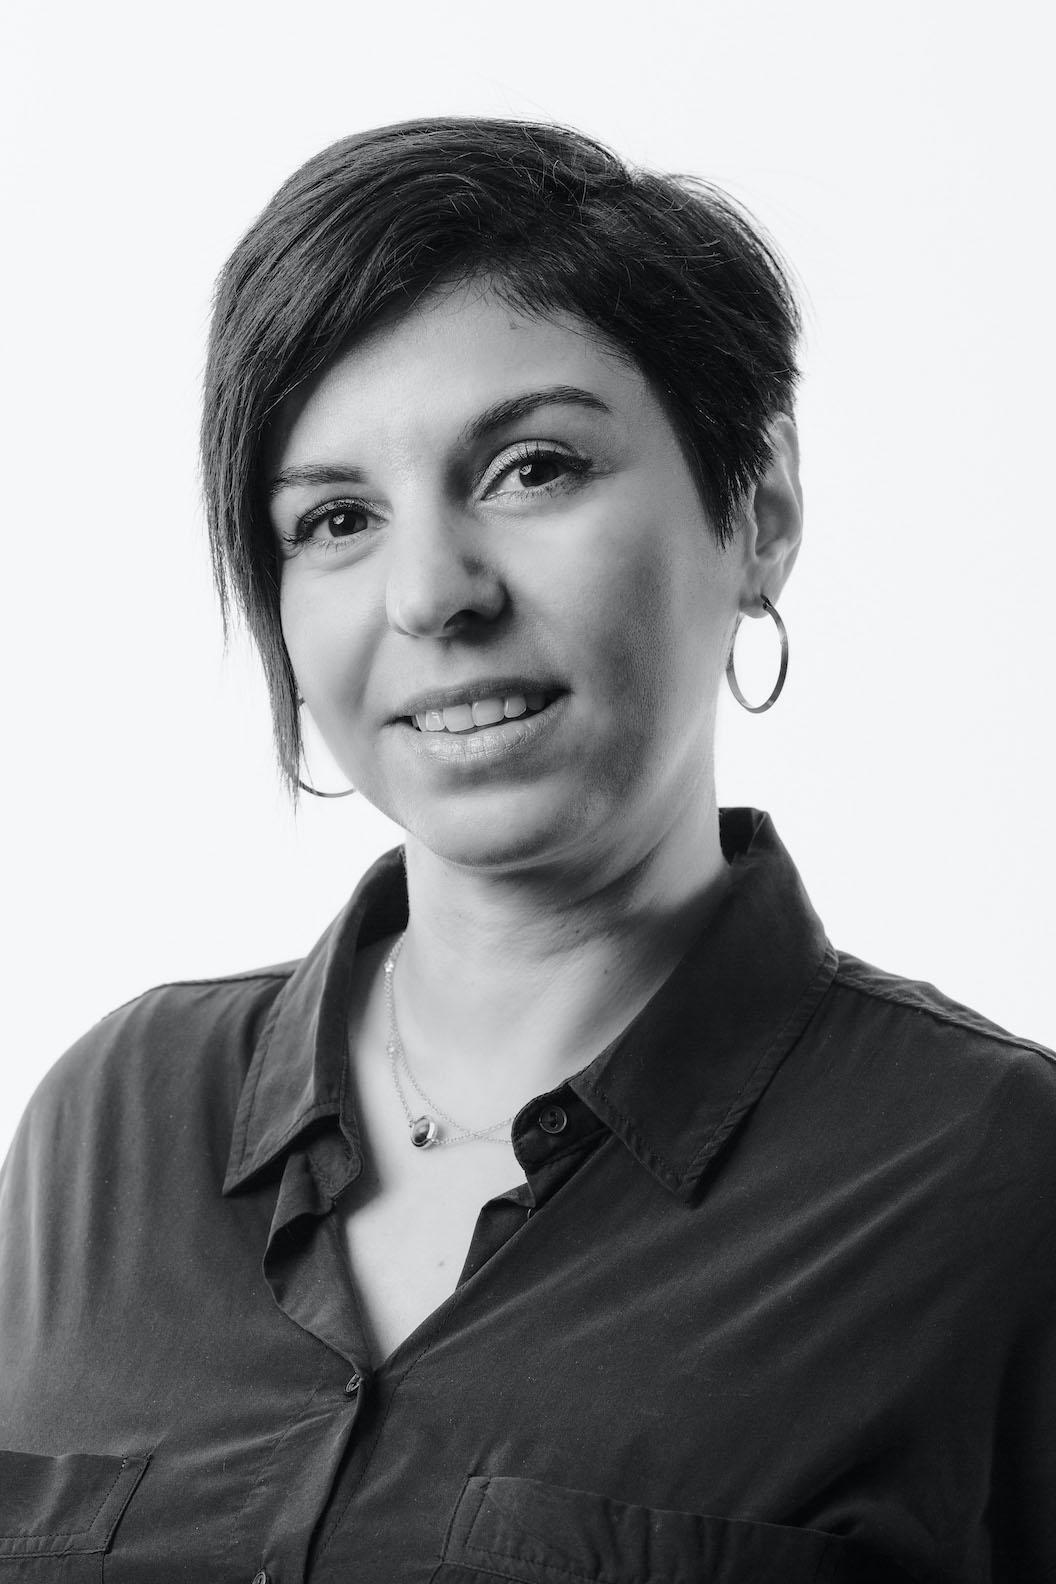 Chloe Kazamia